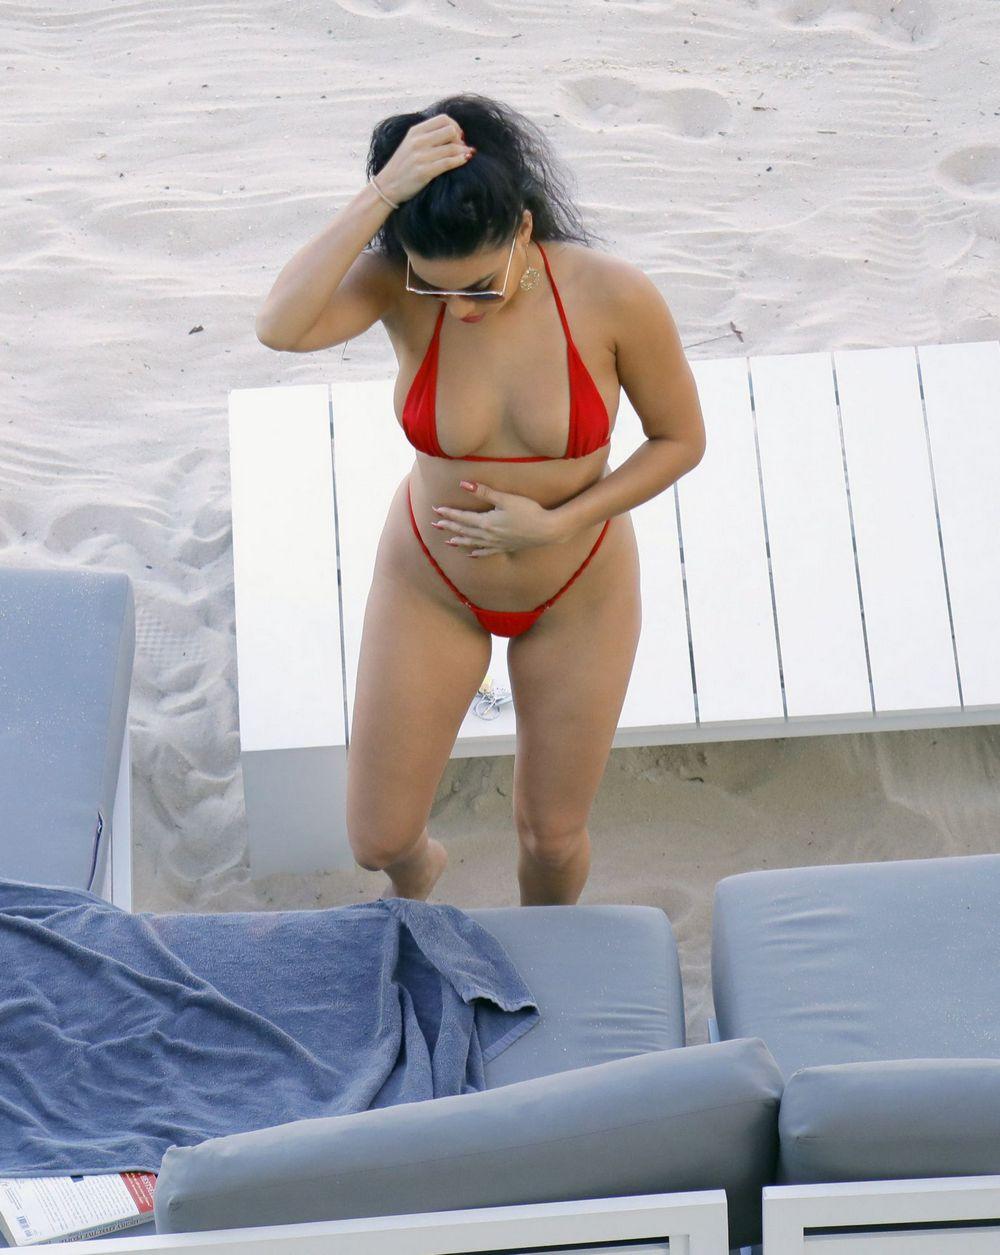 Julissa-Neal-in-a-Tiny-Red-Bikini%21-g6u7wbwdk0.jpg